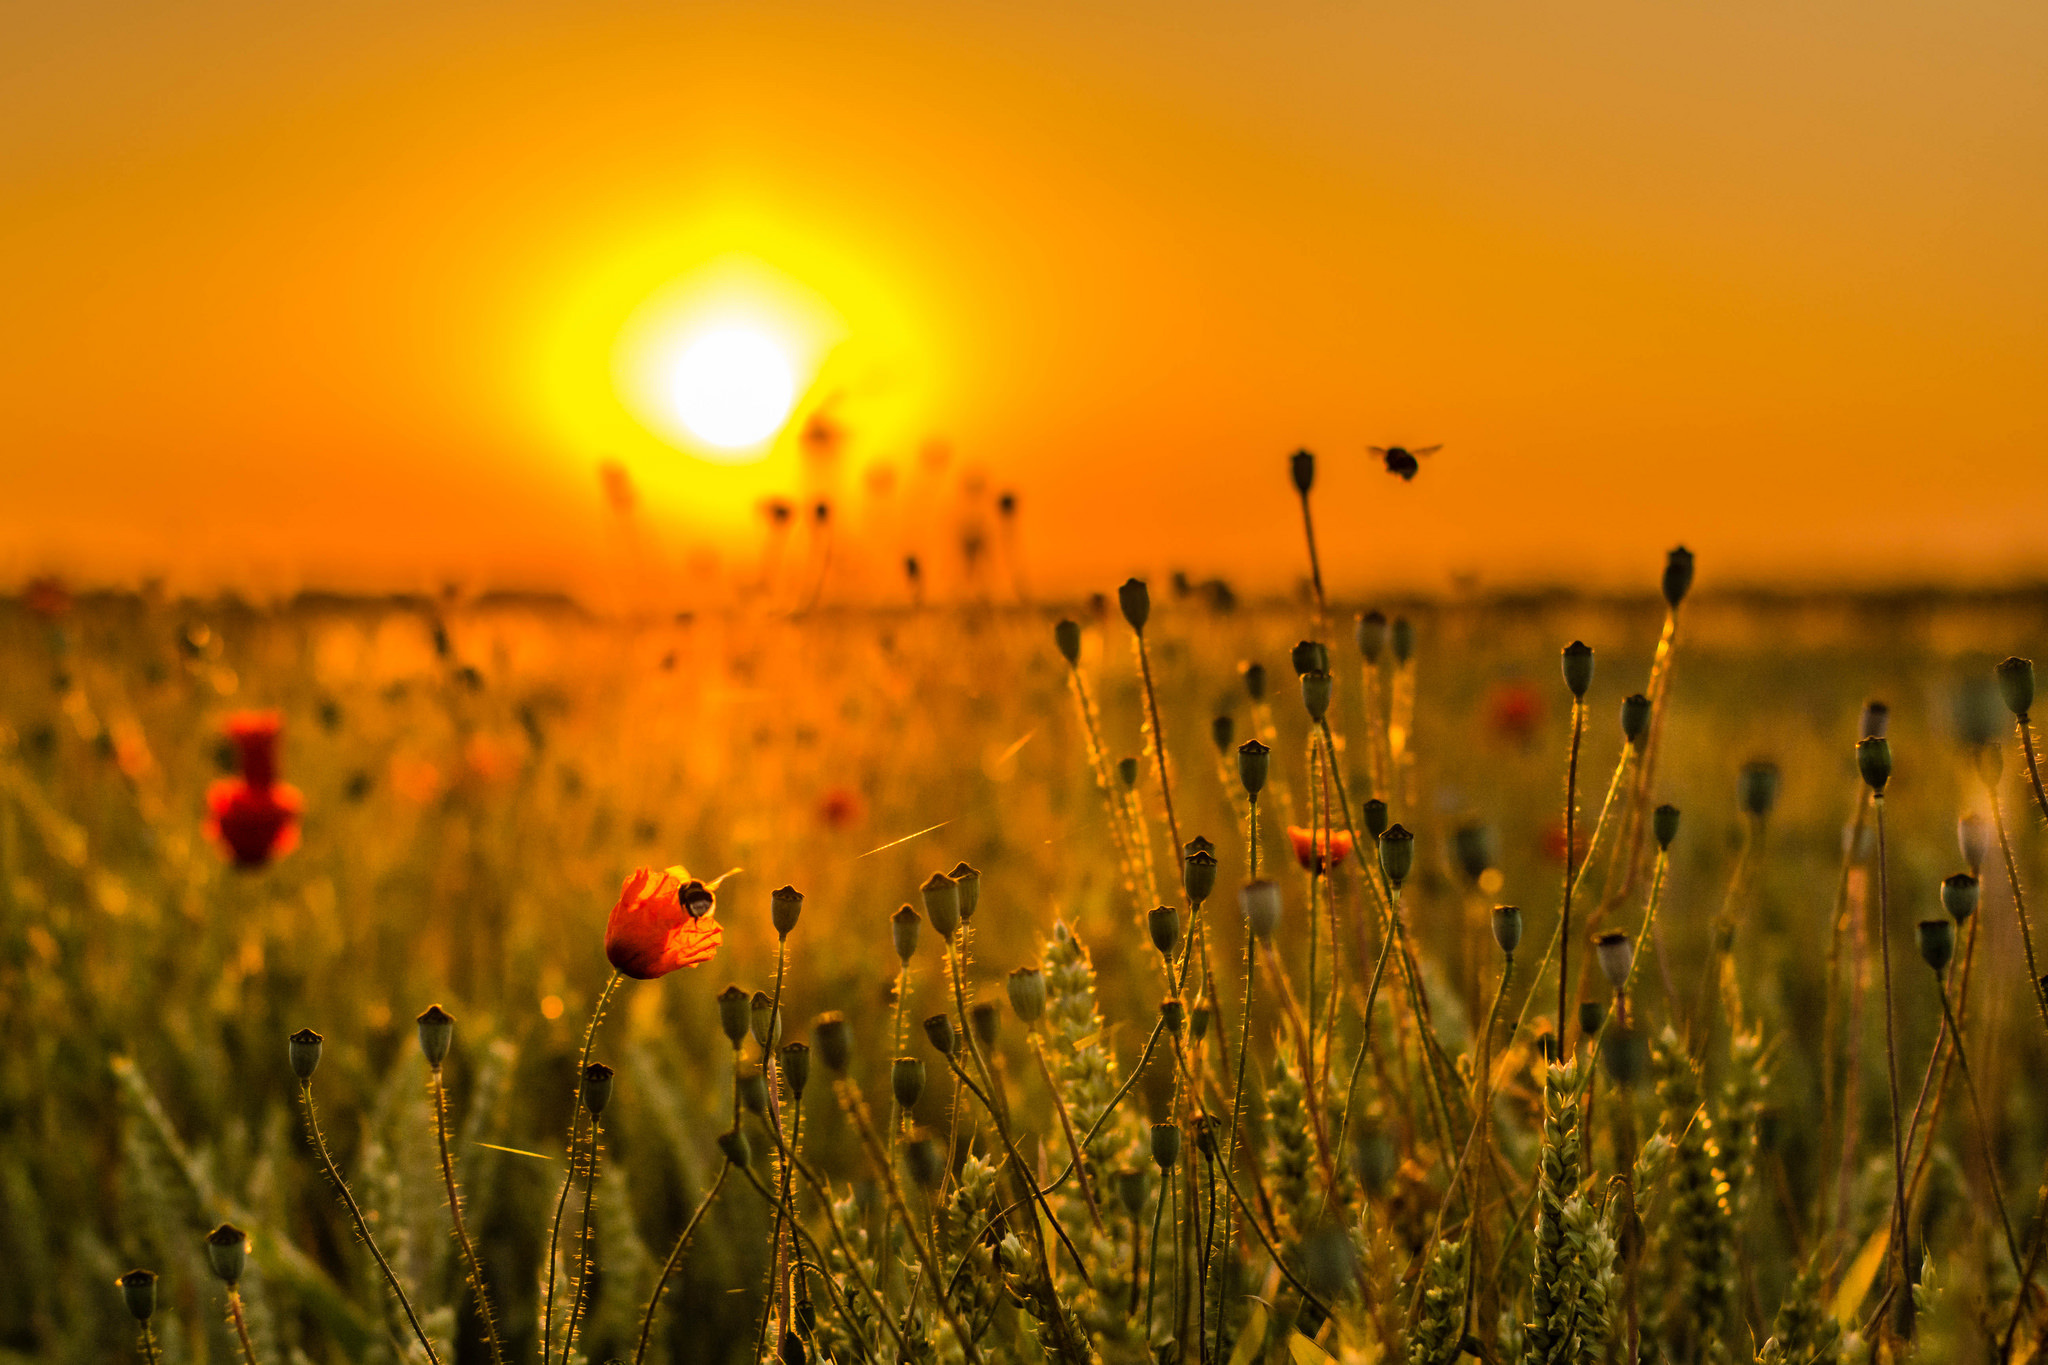 цветочная поляна небо закат скачать